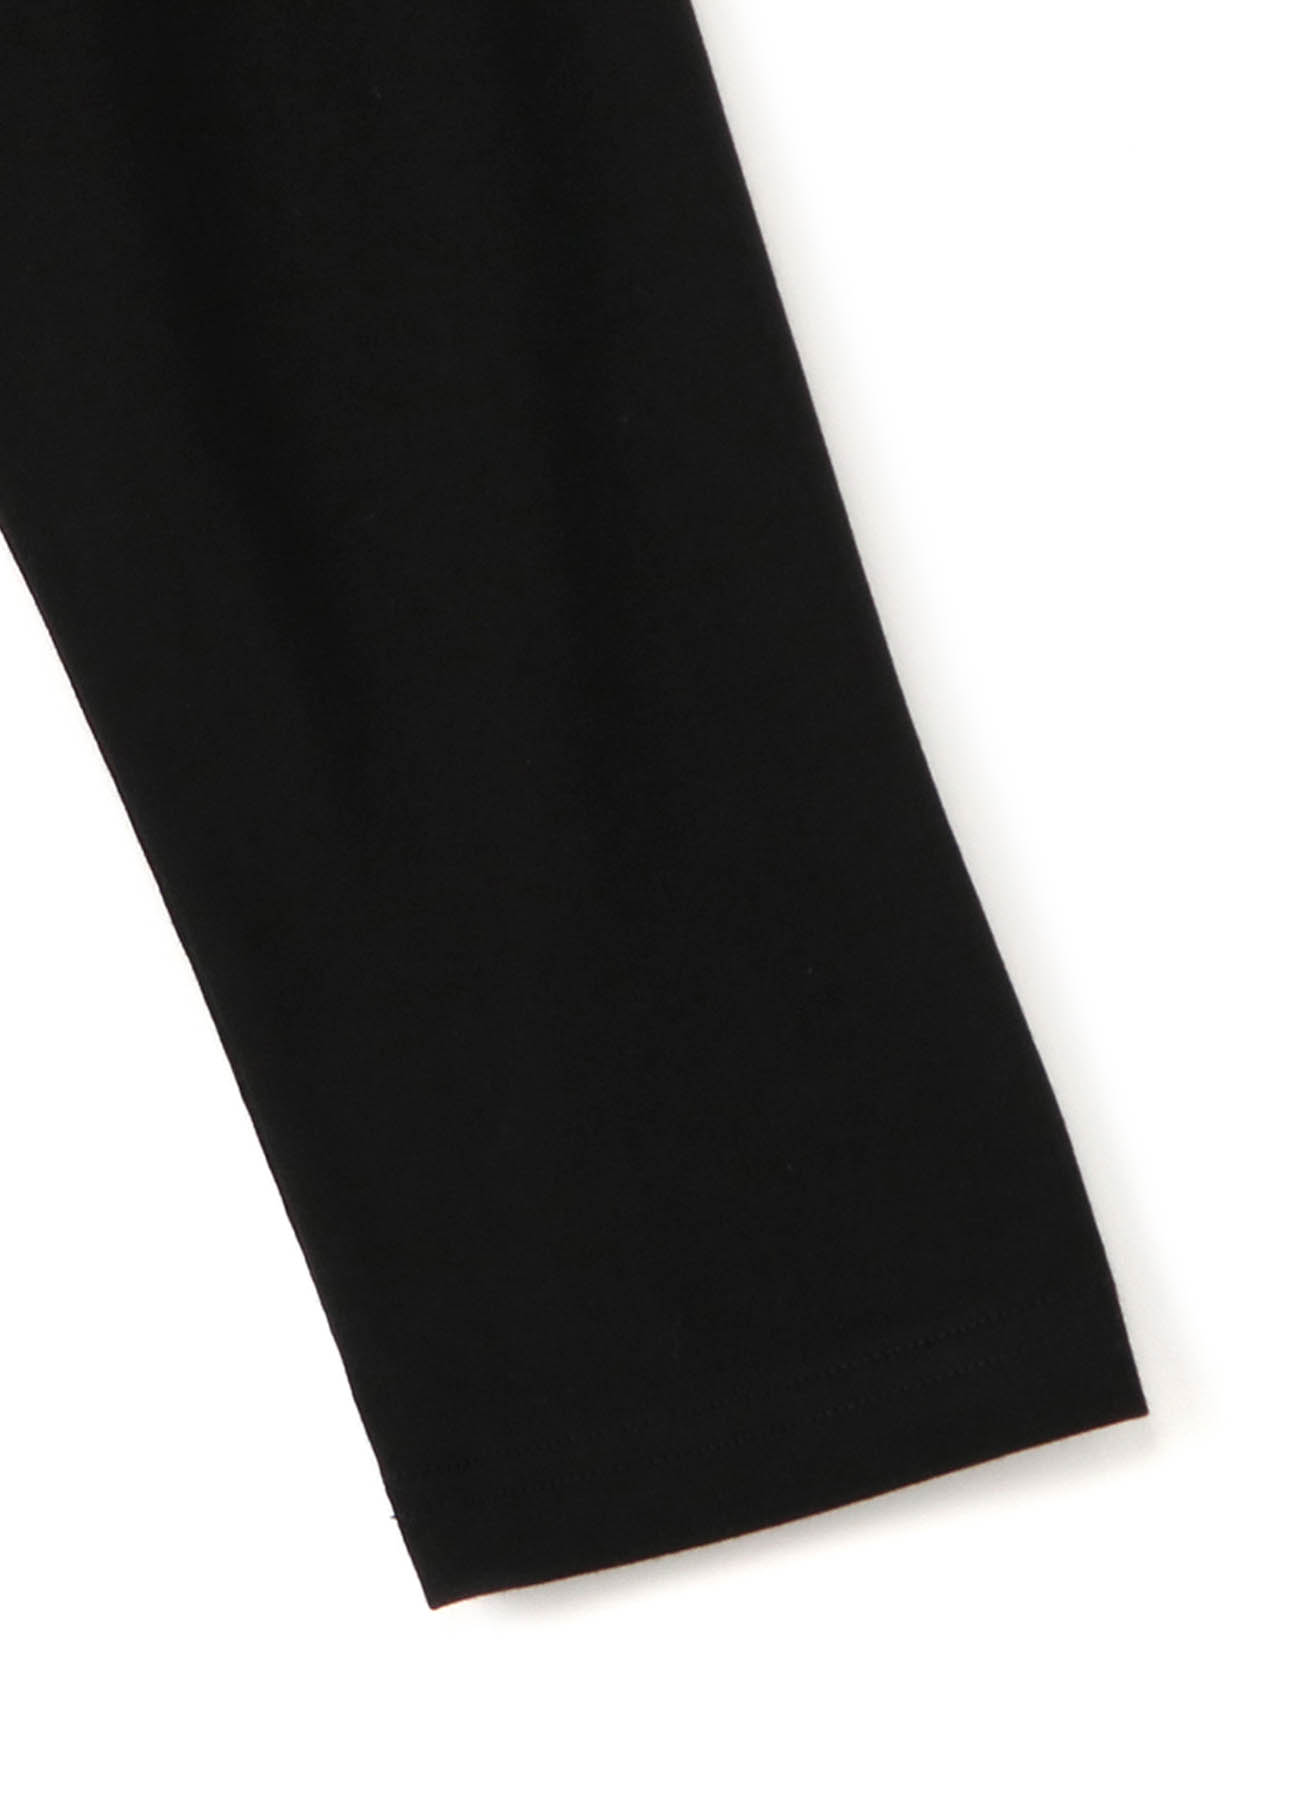 60/2 COTTON SUVIN GIZA JERSEY LONG SLEEVE T-SHIRT (L)